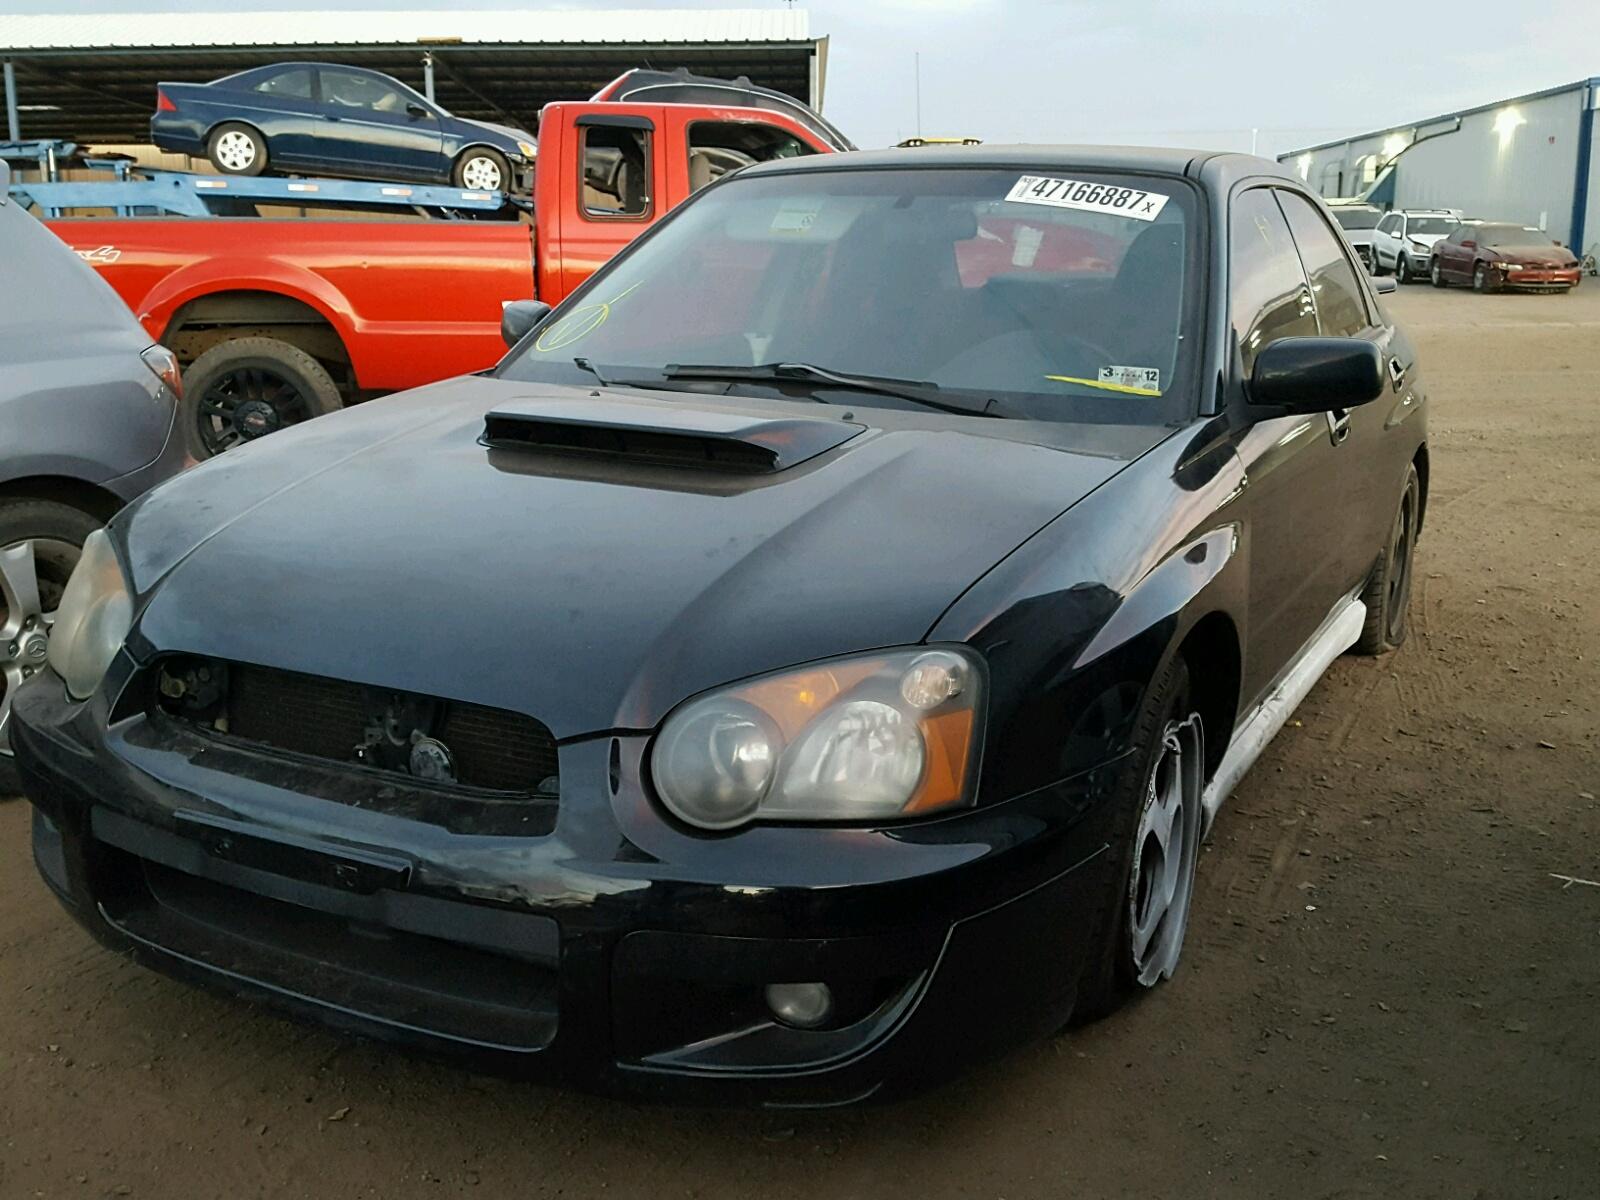 Jf1gd29635g503144 2005 Black Subaru Impreza Wr On Sale